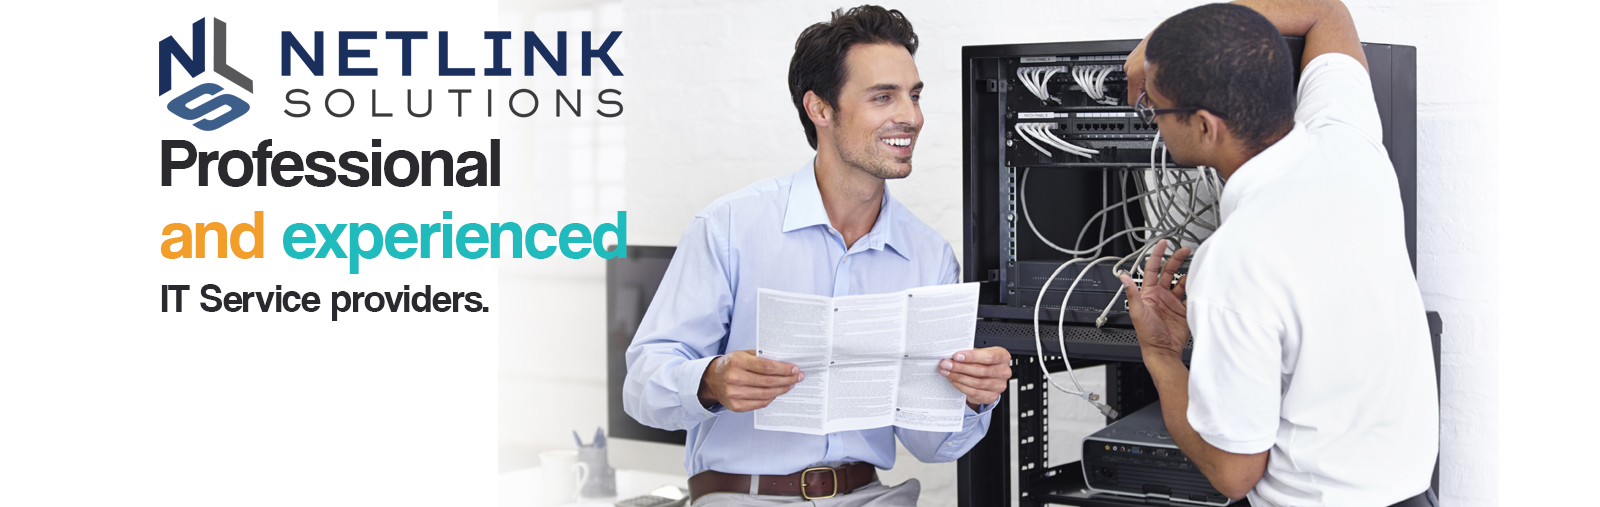 NetLink Solutions, LLC image 6